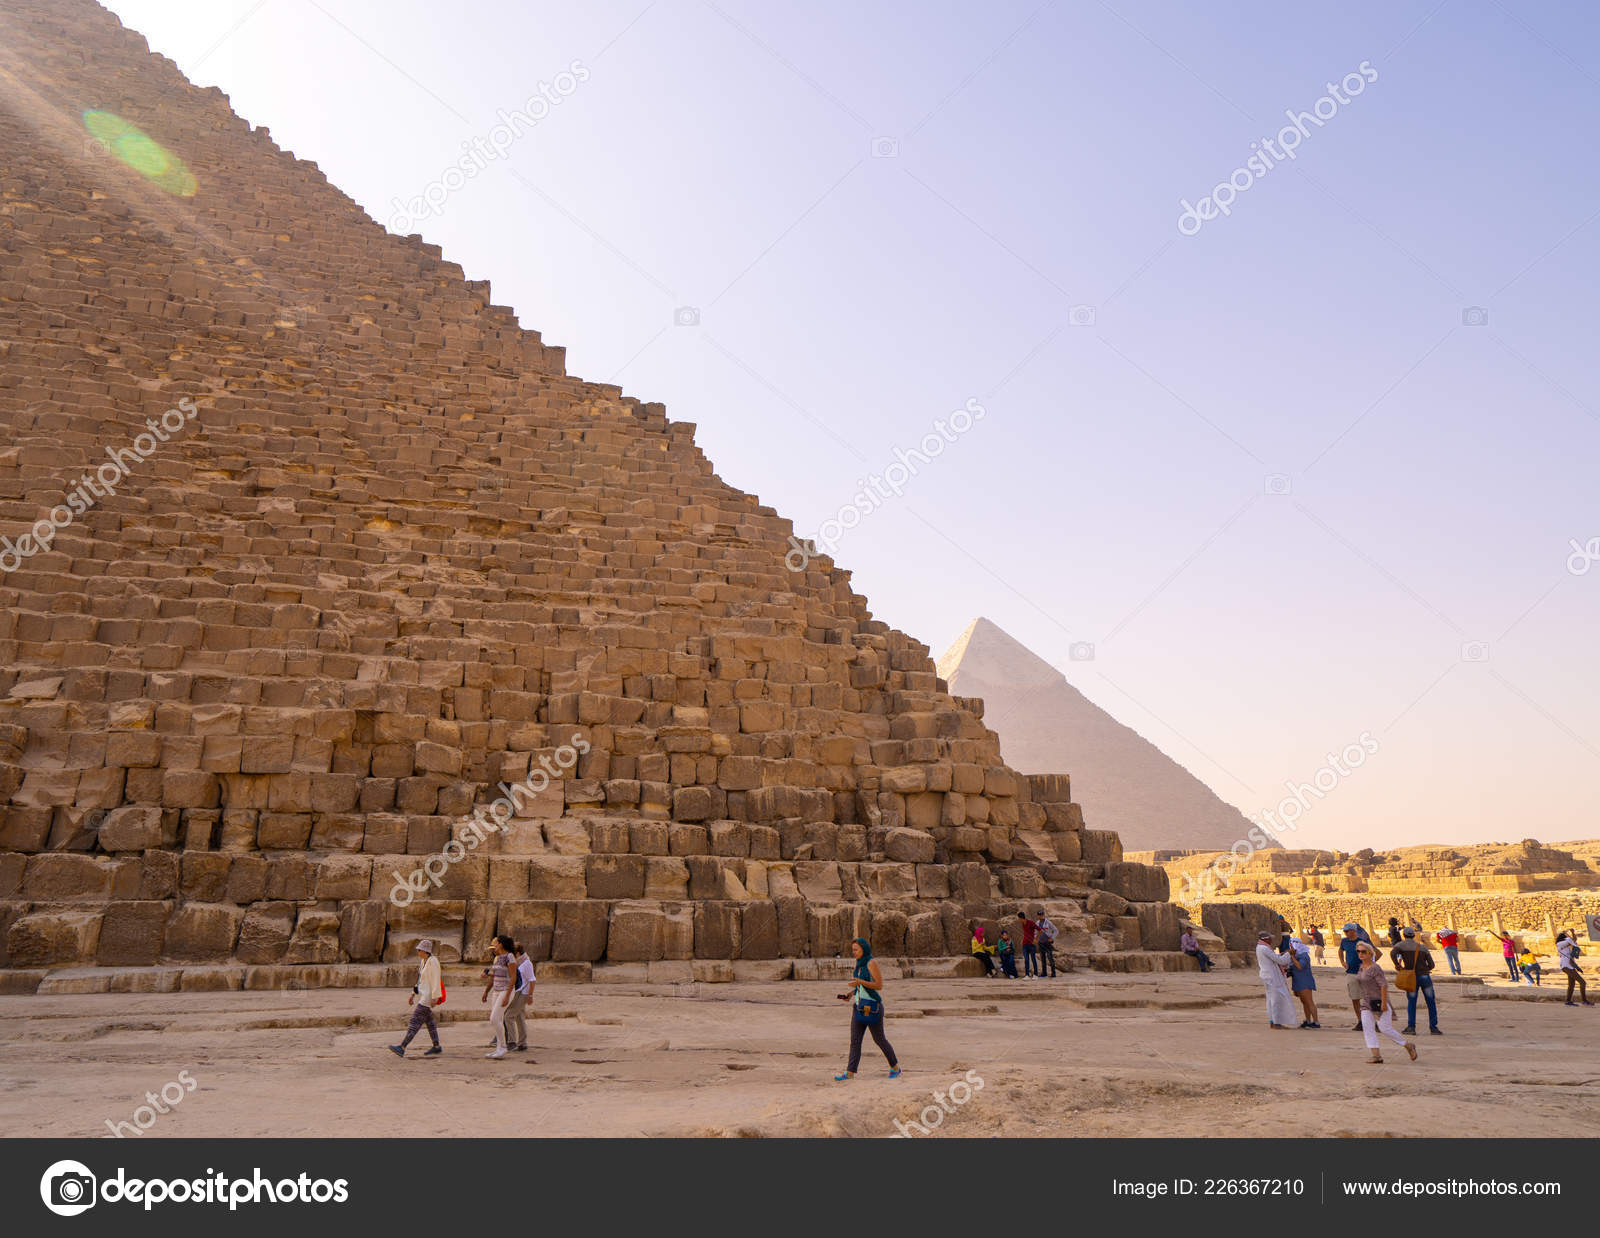 People Taking Photos Selfies Pyramids Giza Cairo Captured Egypt